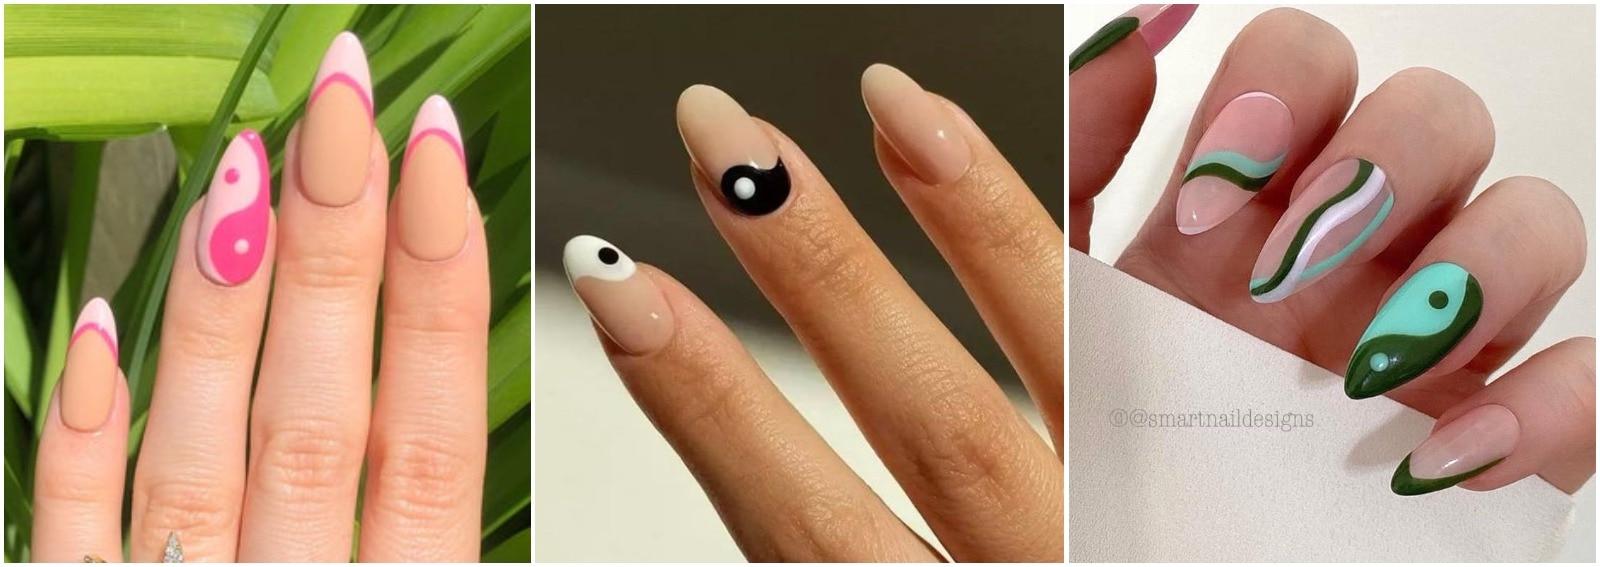 unghie ying yang manicure cover desktop